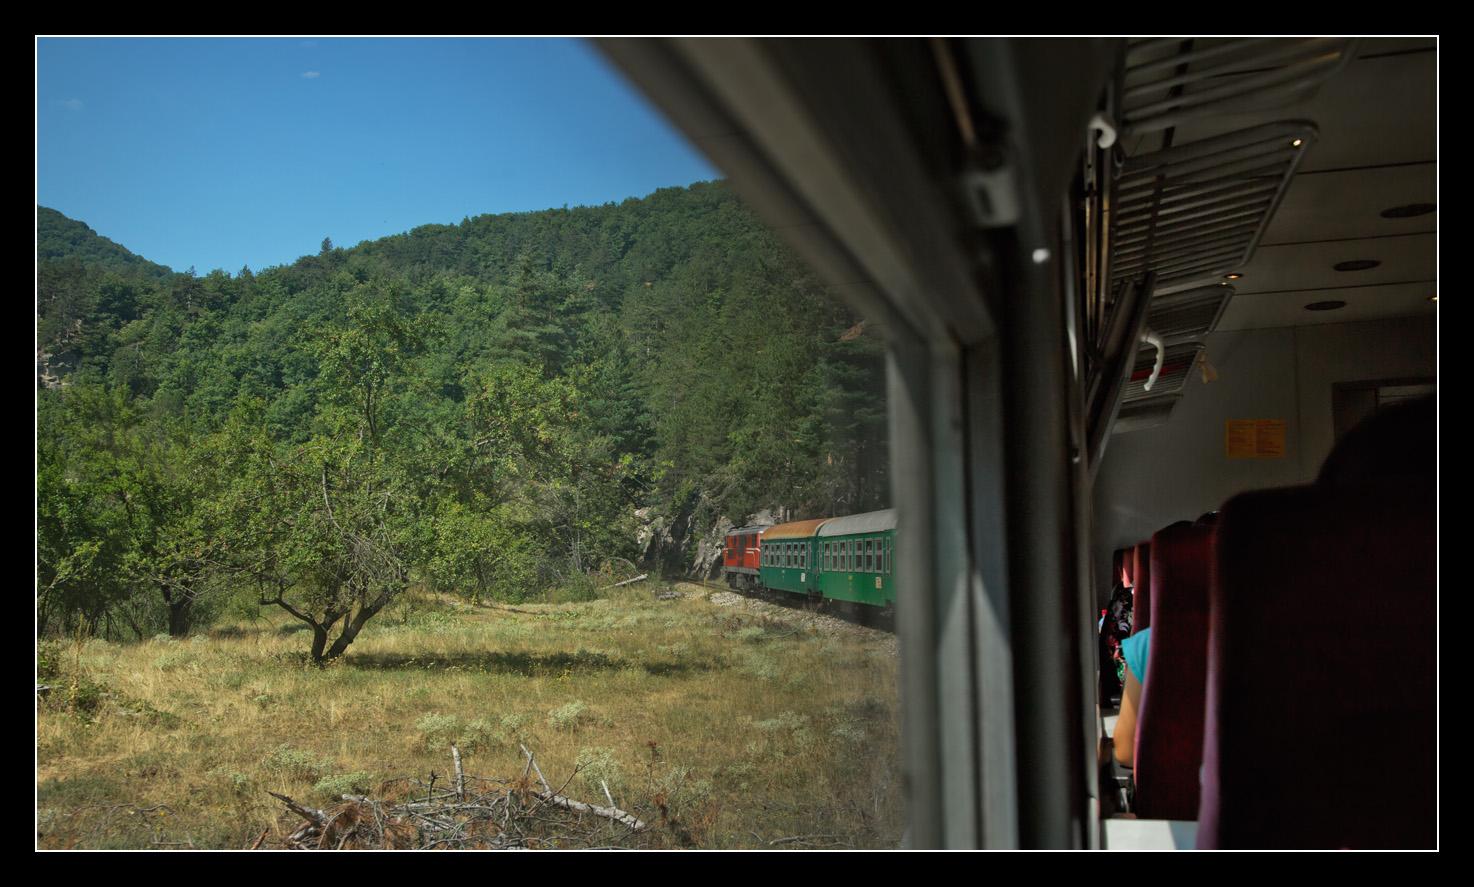 Urlaub in bulgarien 2015 23 in die rhodopen 50 b - Fenster nur halb kippen ...